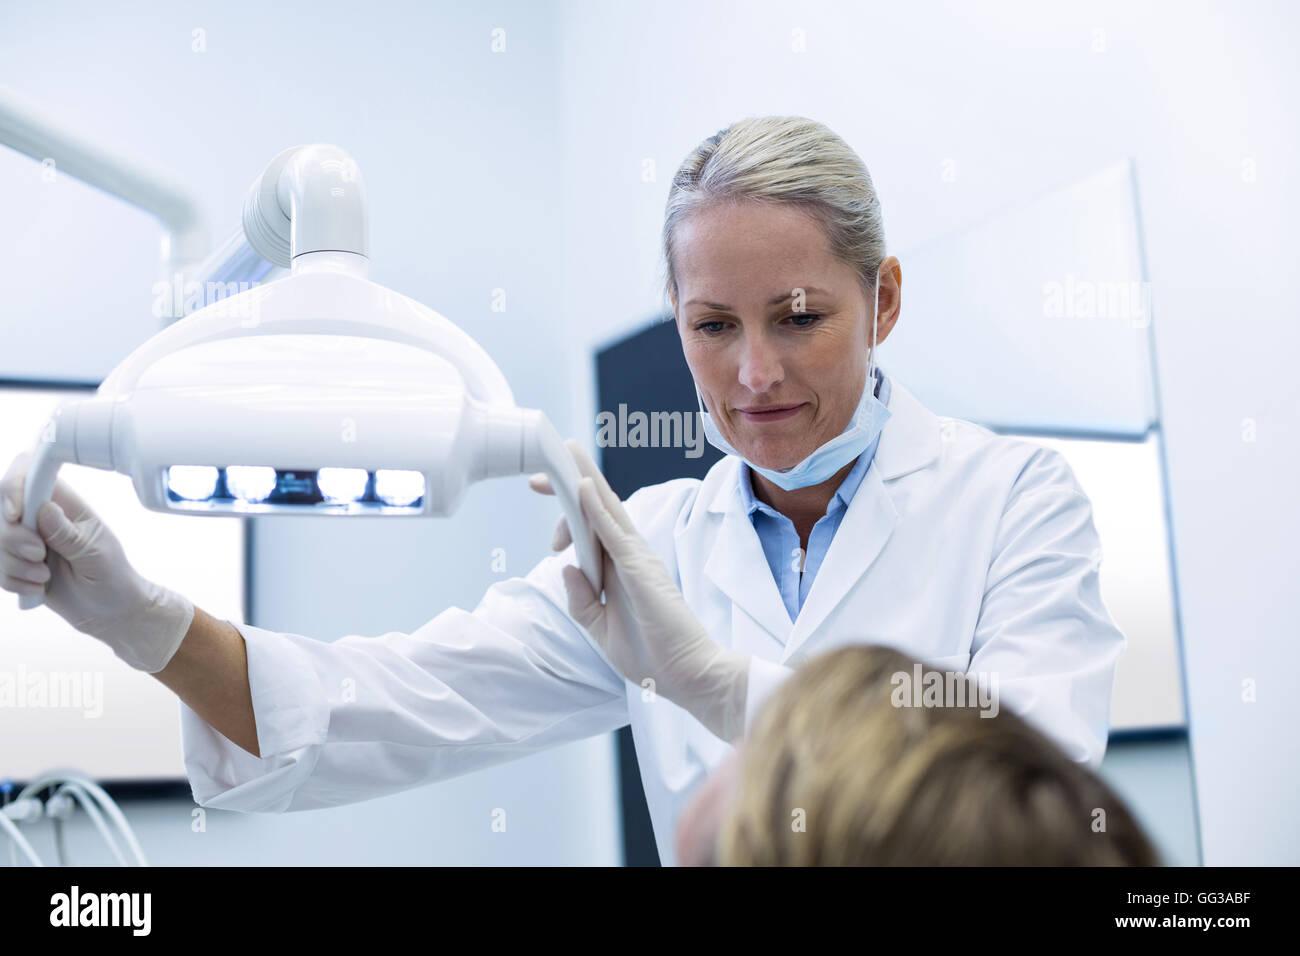 Dentista femmina regolazione luce dentale Immagini Stock